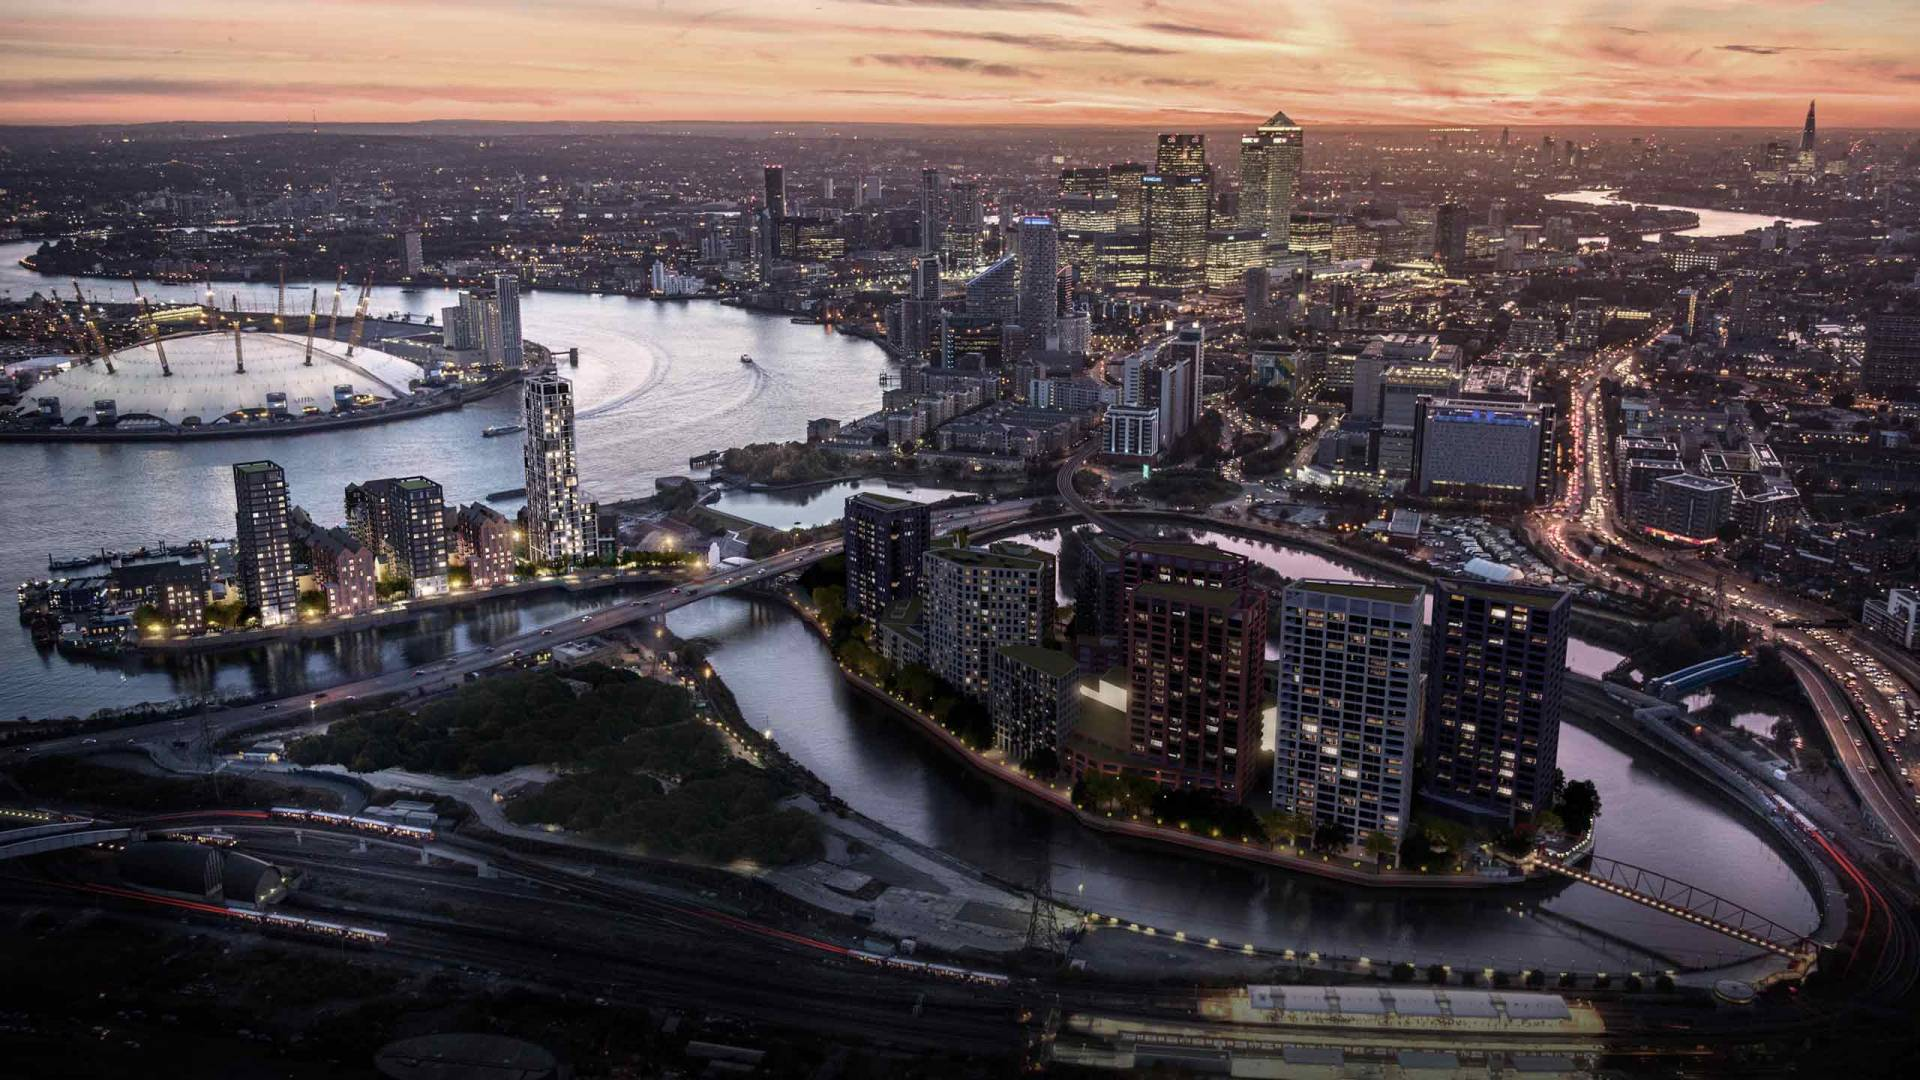 london-city-island-aerial-view-goodluck-hope-o2-canary-wharf